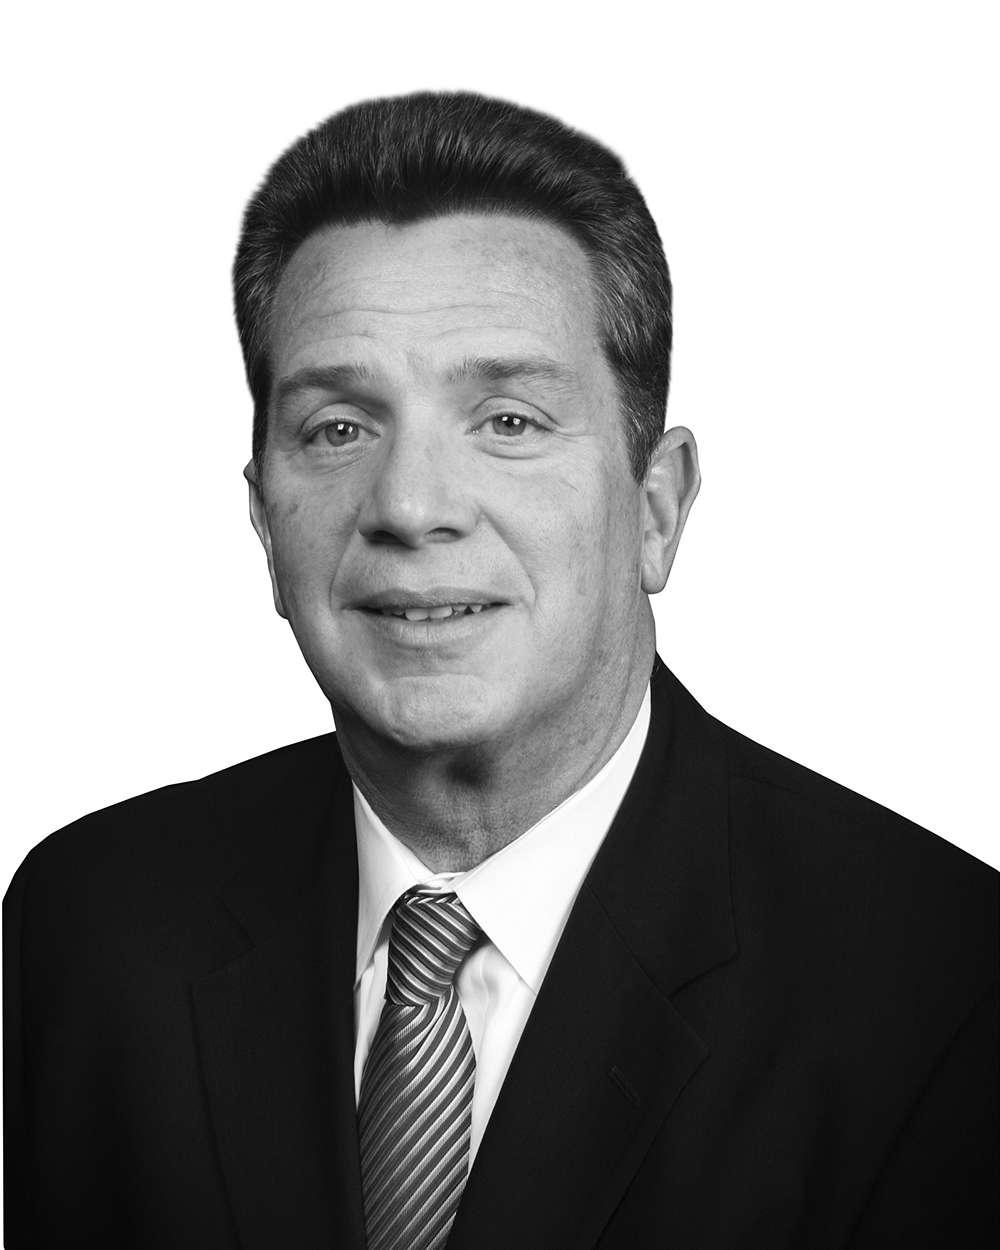 7. Frank Molinaro